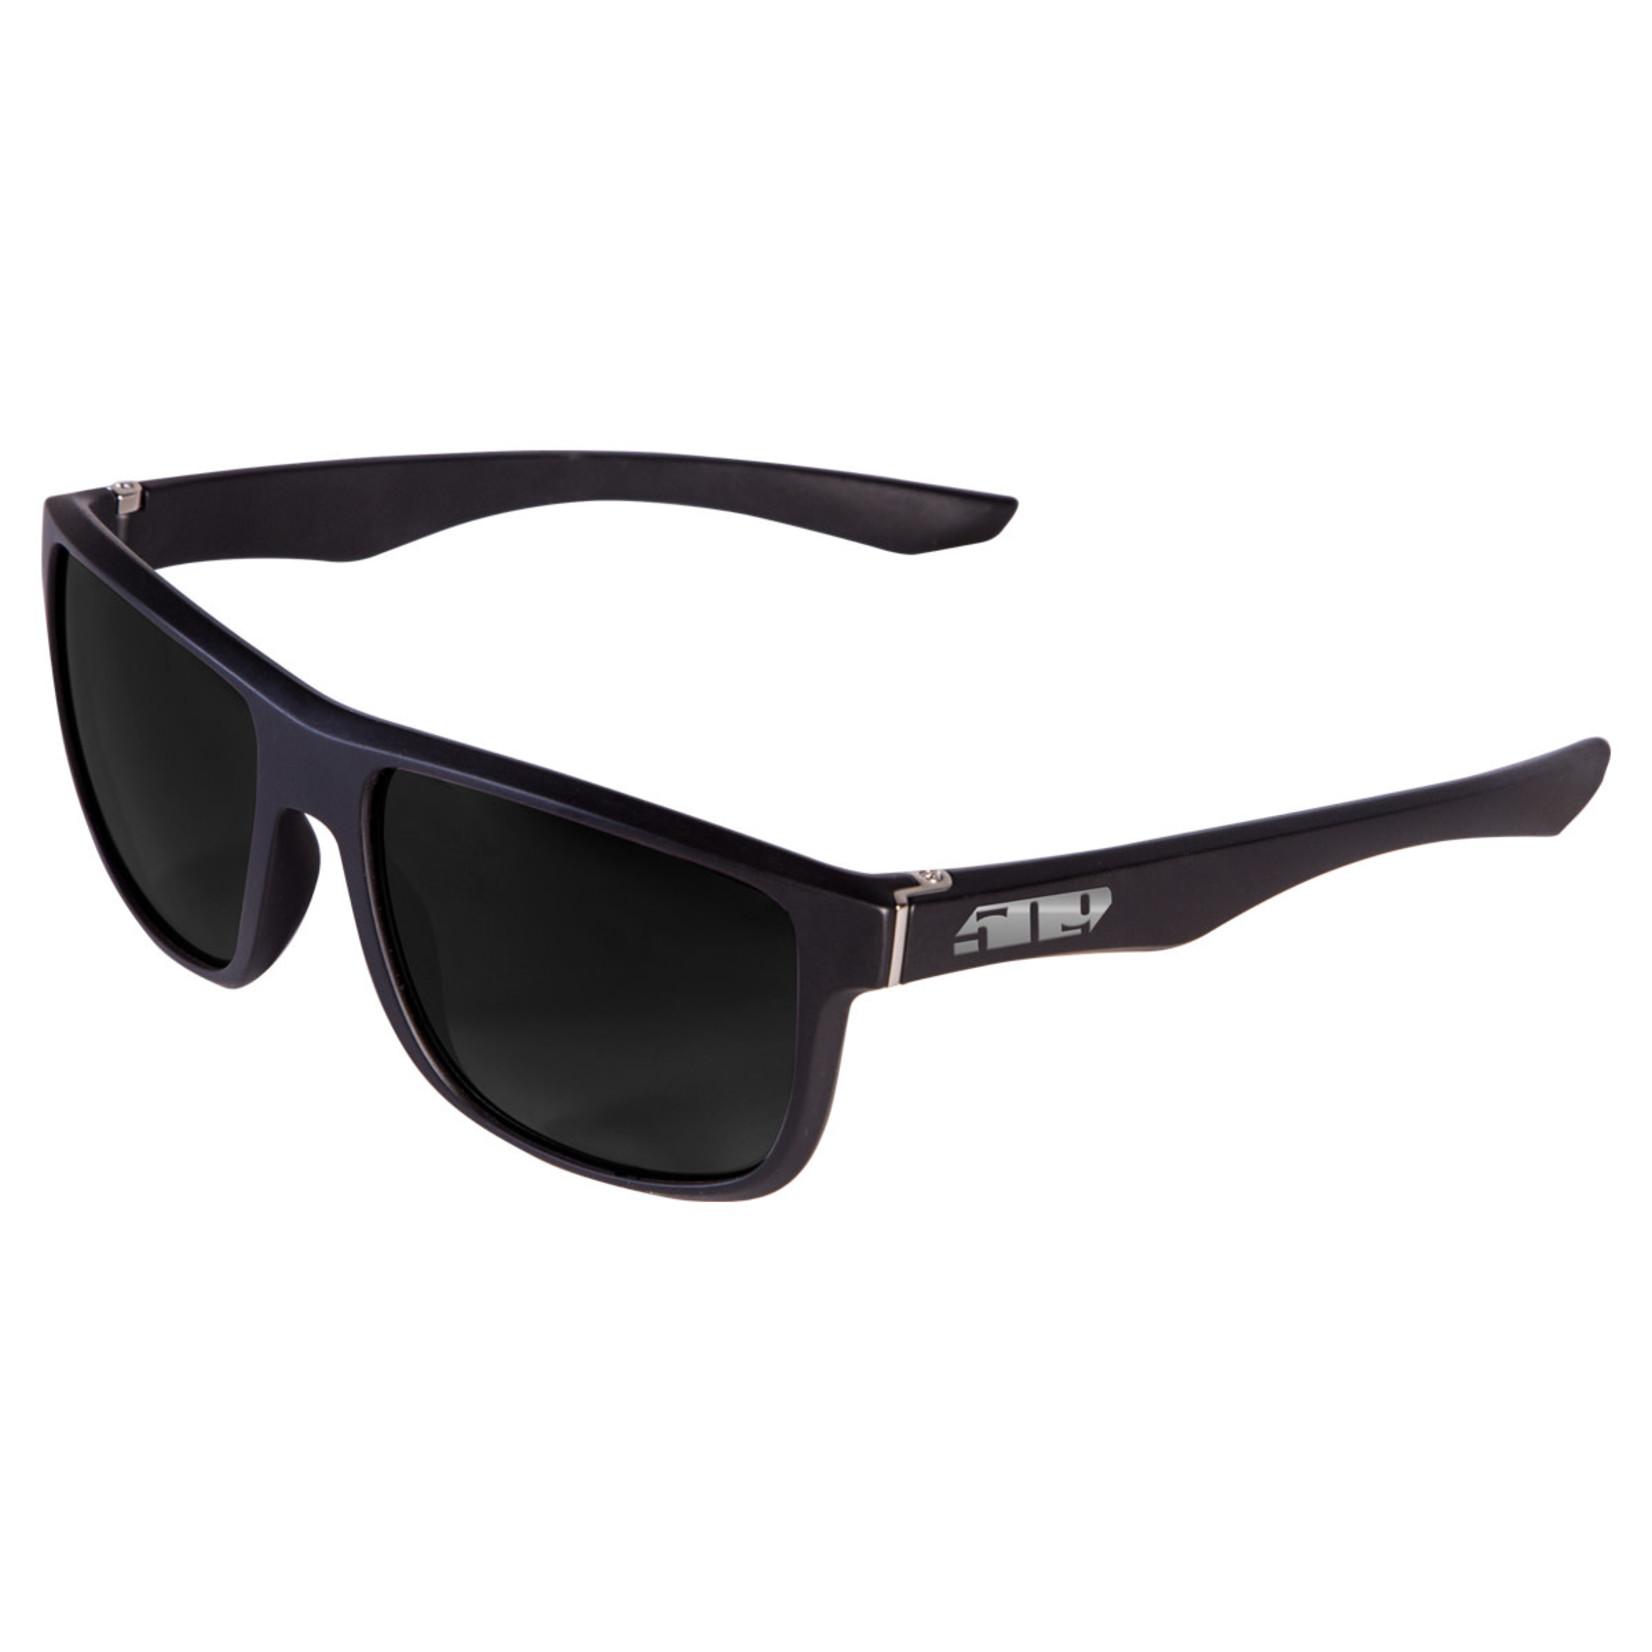 509 Riverside Sunglasses - Matte Black (Polarized Smoke Tint)